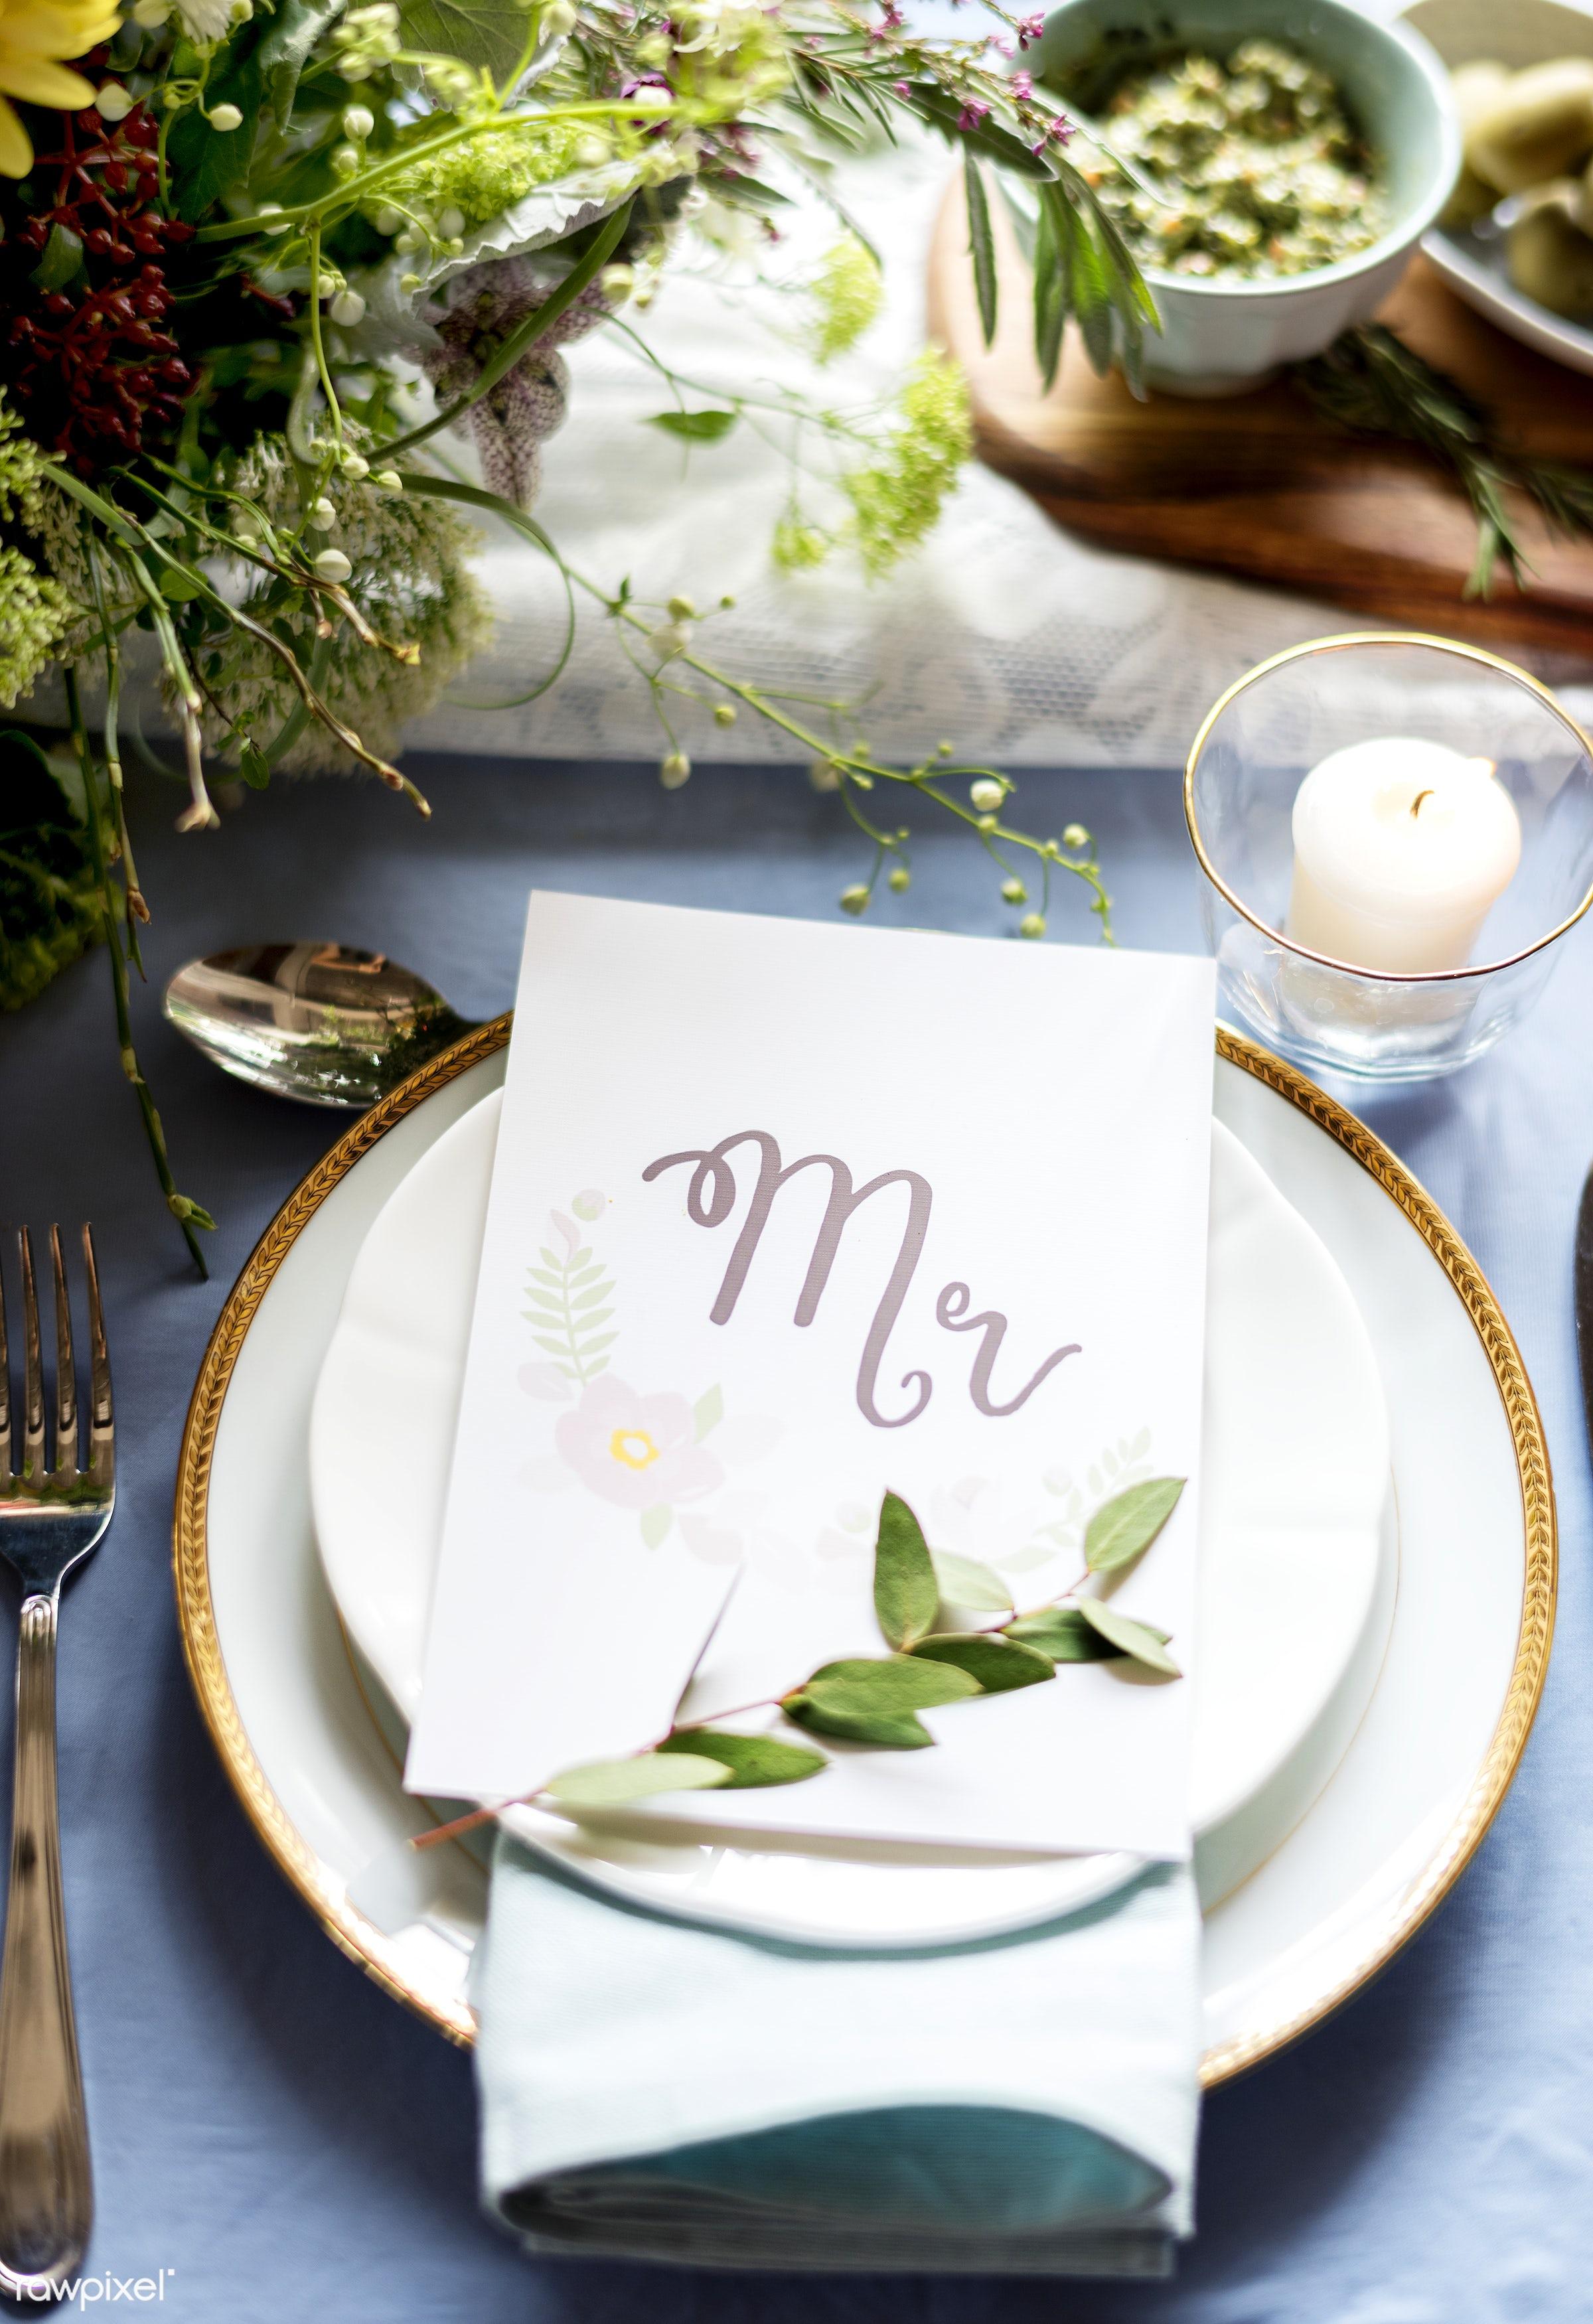 wedding, card, meeting, party, ceremony, restaurant, aerial view, arrangement, banquet, cutlery, decoration, detail, dinner...